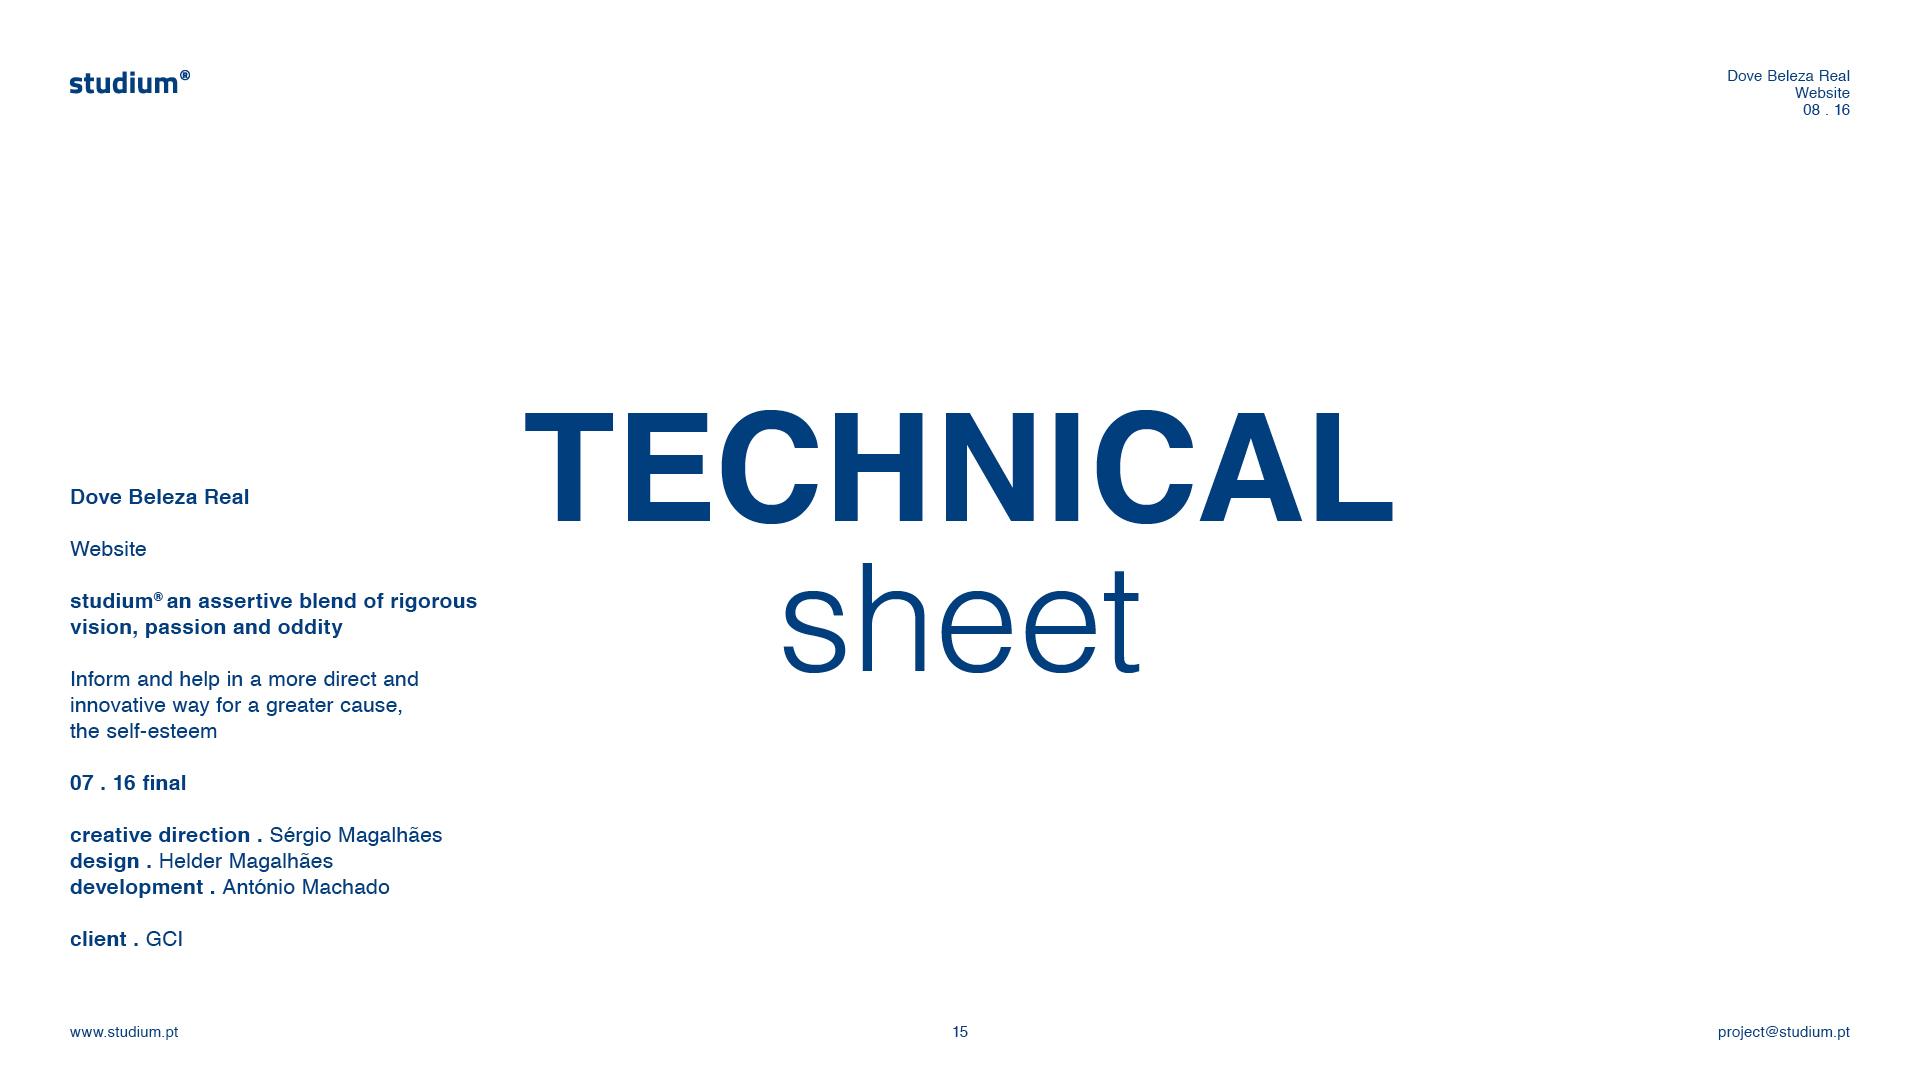 WEB20150063-DOVEBELEZAREAL-Website-Presentation-T-PU.15